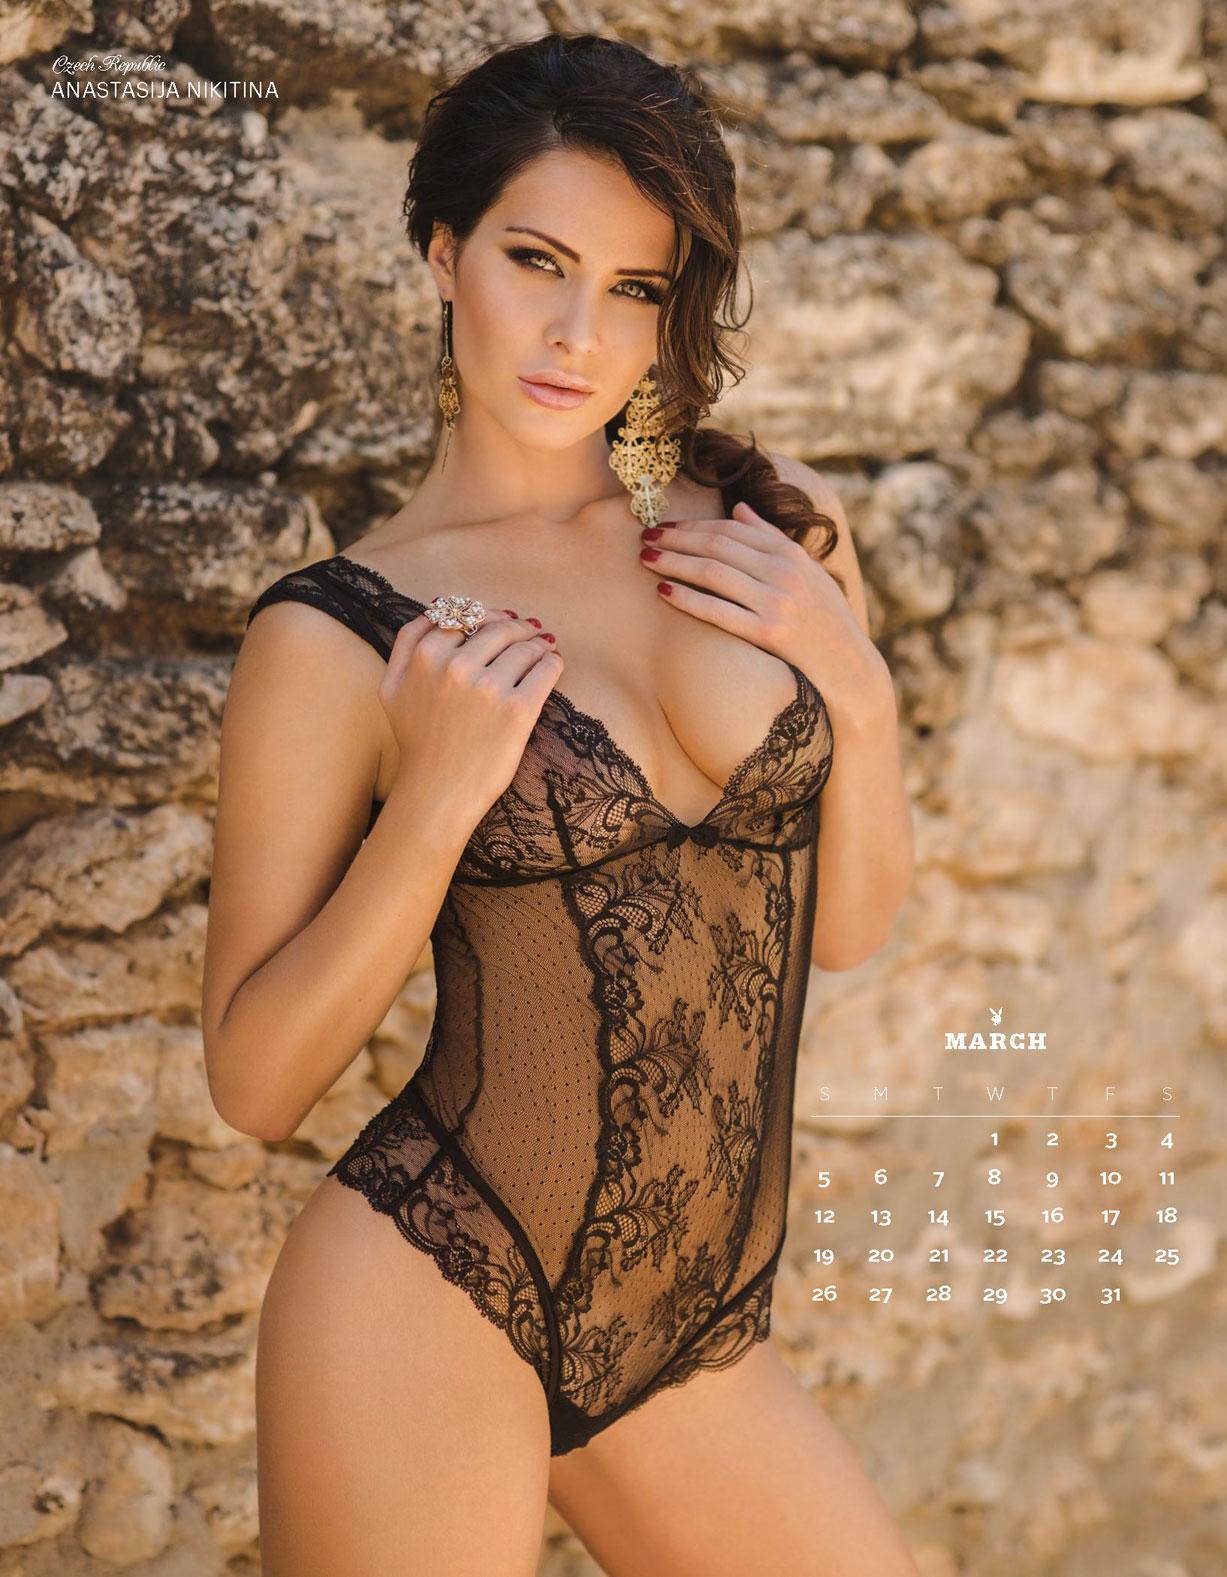 Playboy USA 2017 Official Calendar - Playmates Around the World - Anastasija Nikitina | Czech Republic